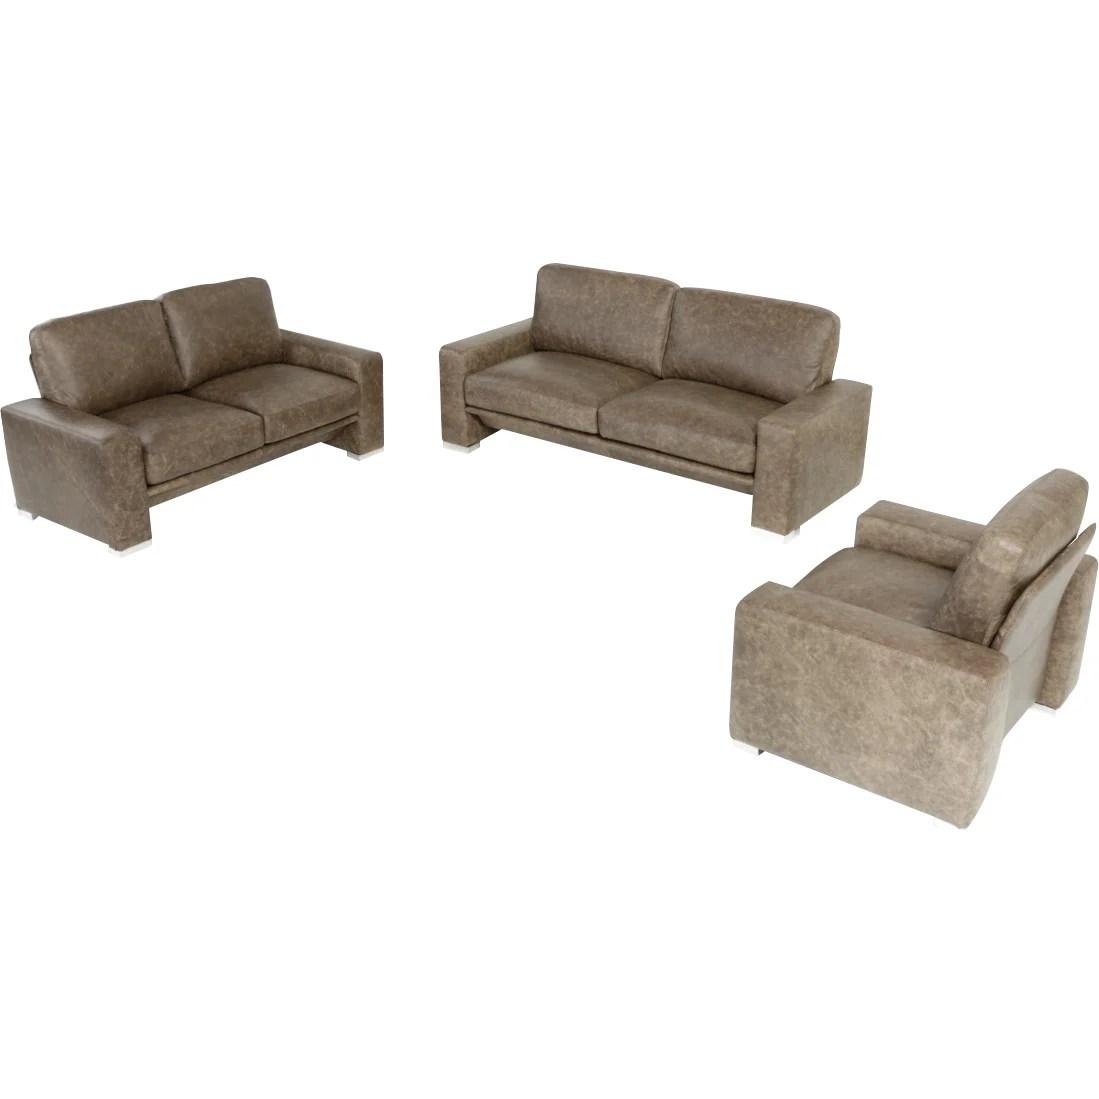 3 piece white leather sofa set sure fit cover uk wade logan northbridge wayfair